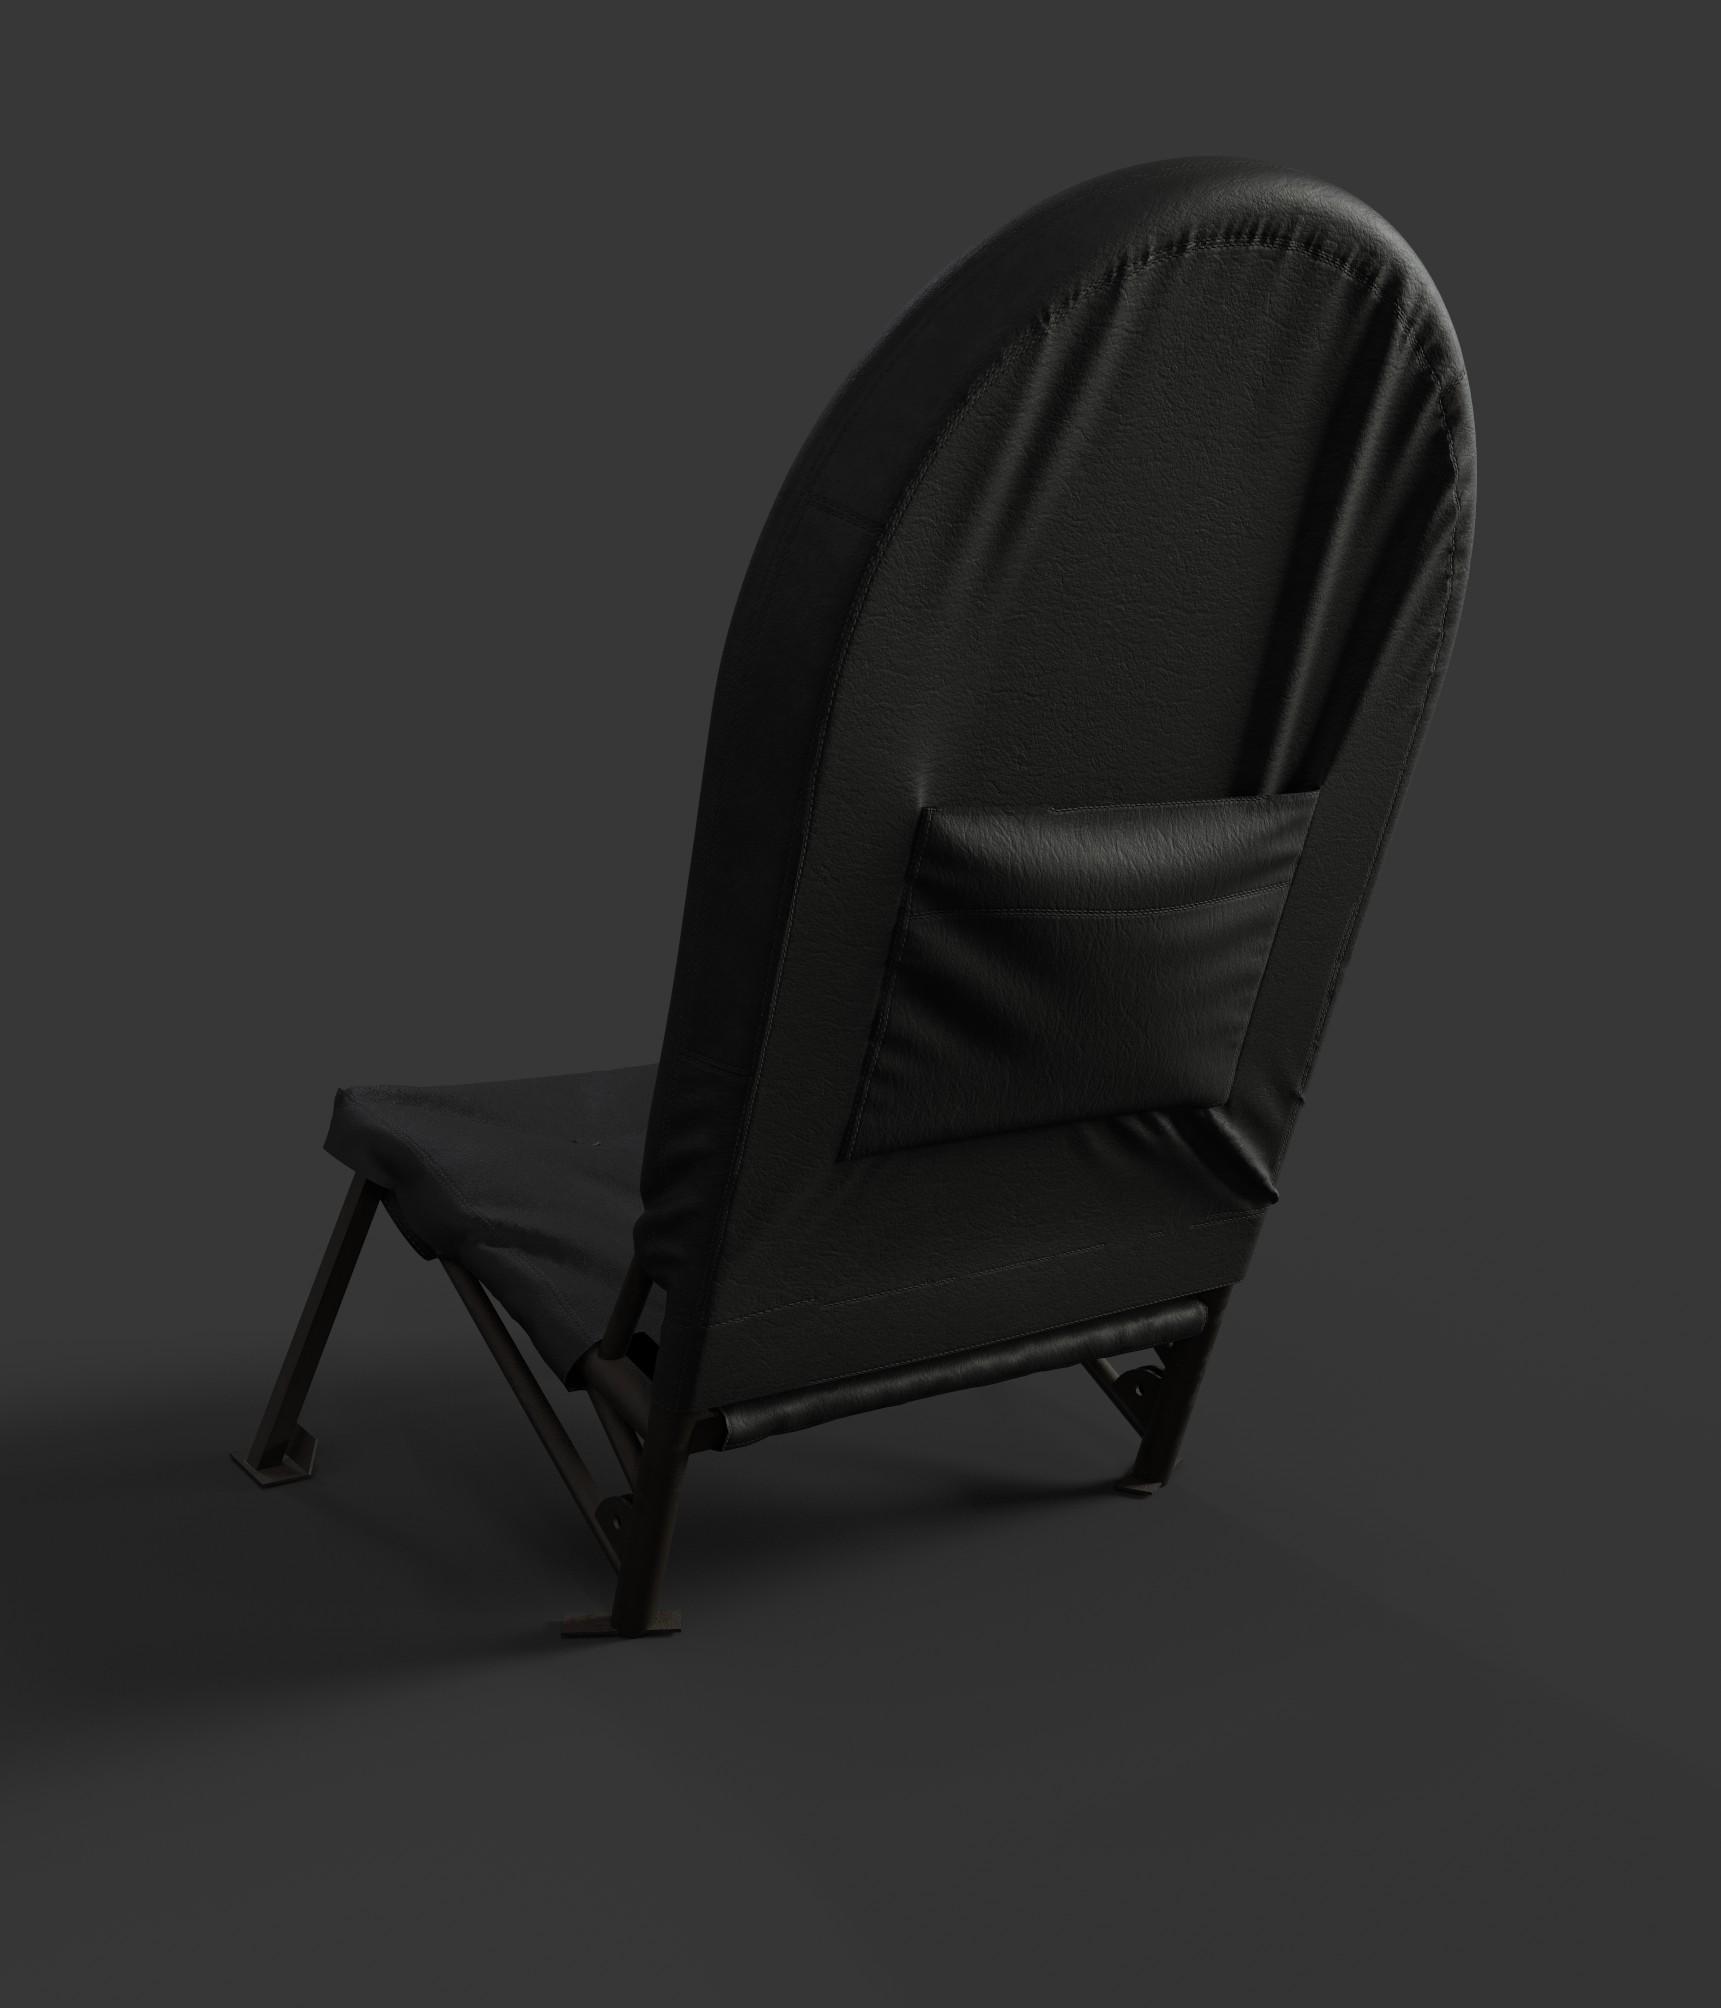 j3Cub-Seat08.jpg